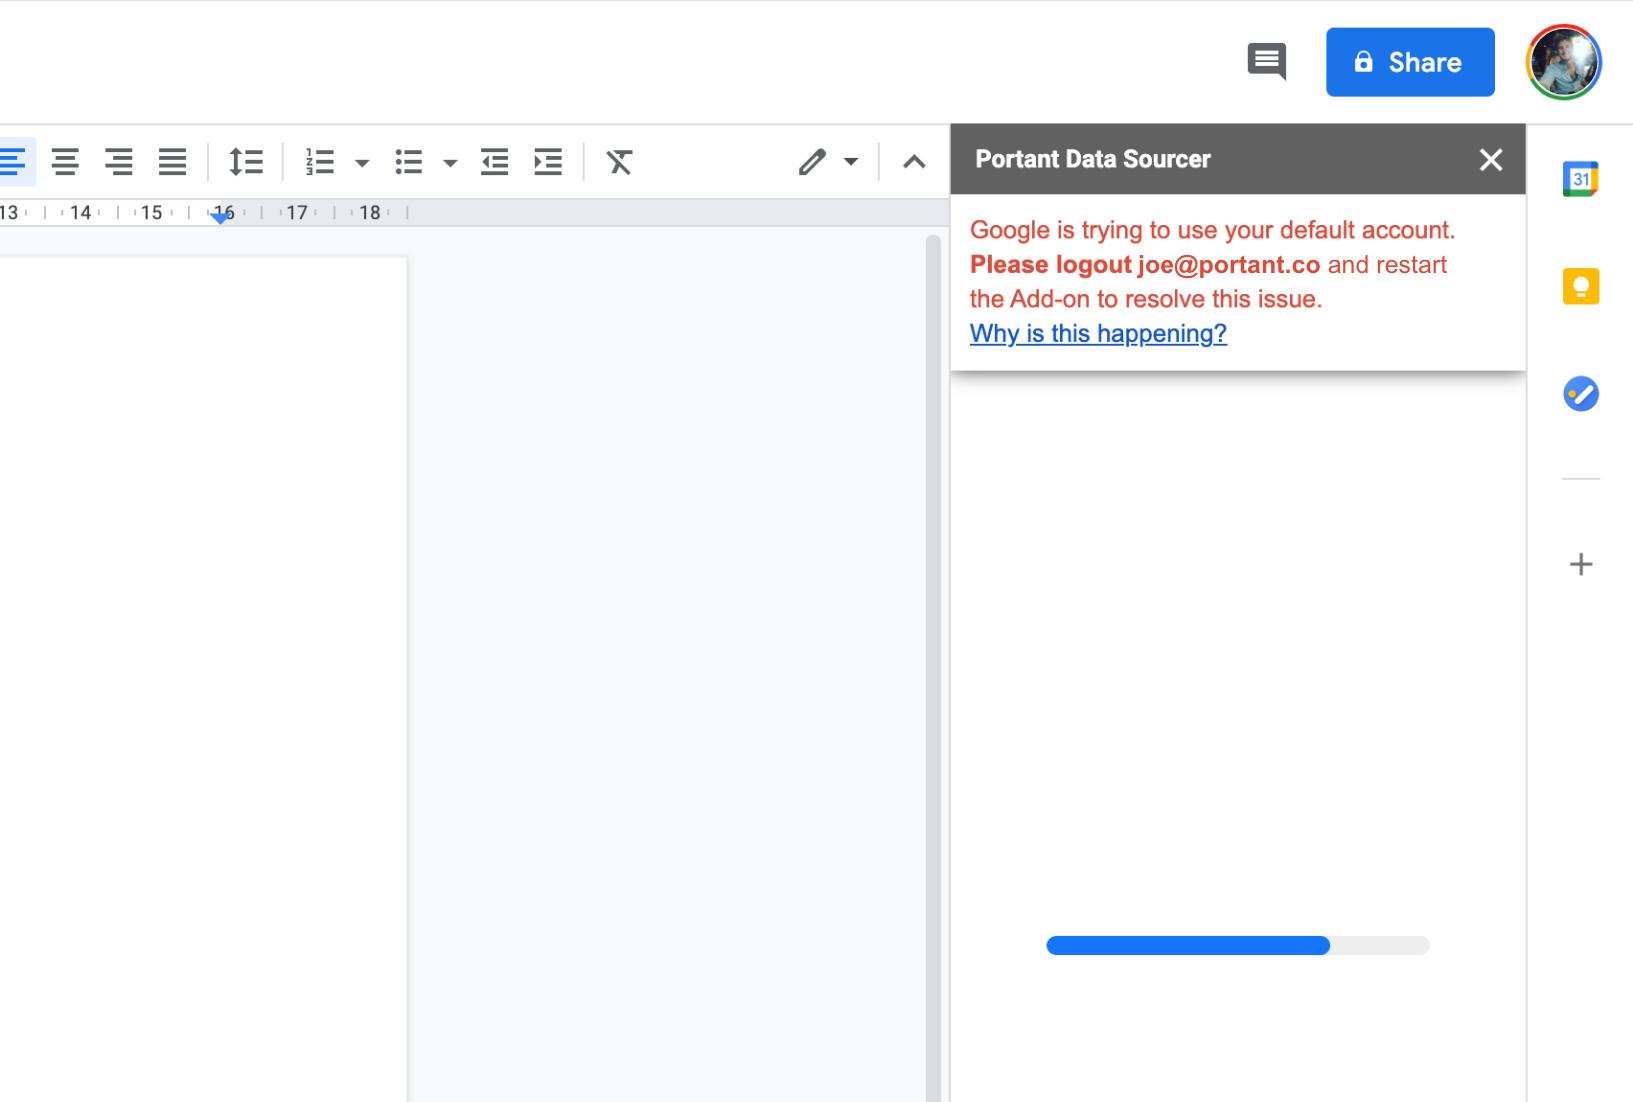 The error message shown by google when an Authorisation Error occurs.